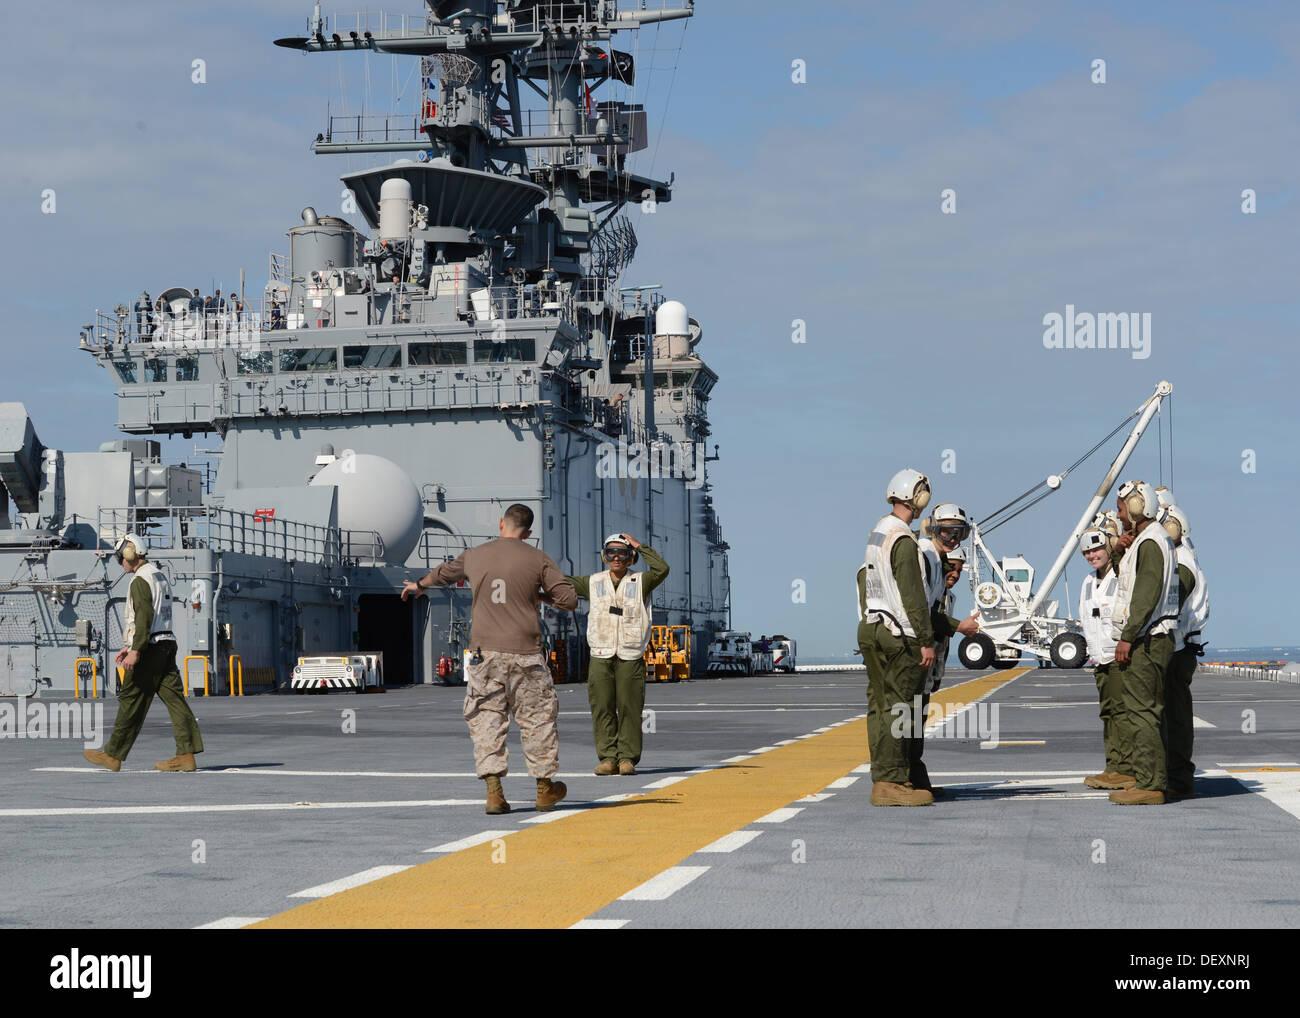 ATLANTIC OCEAN (Sept. 20, 2013) - Gunnery Sgt. Robert Collins trains Marines on boarding procedures and responsibilities as Air - Stock Image